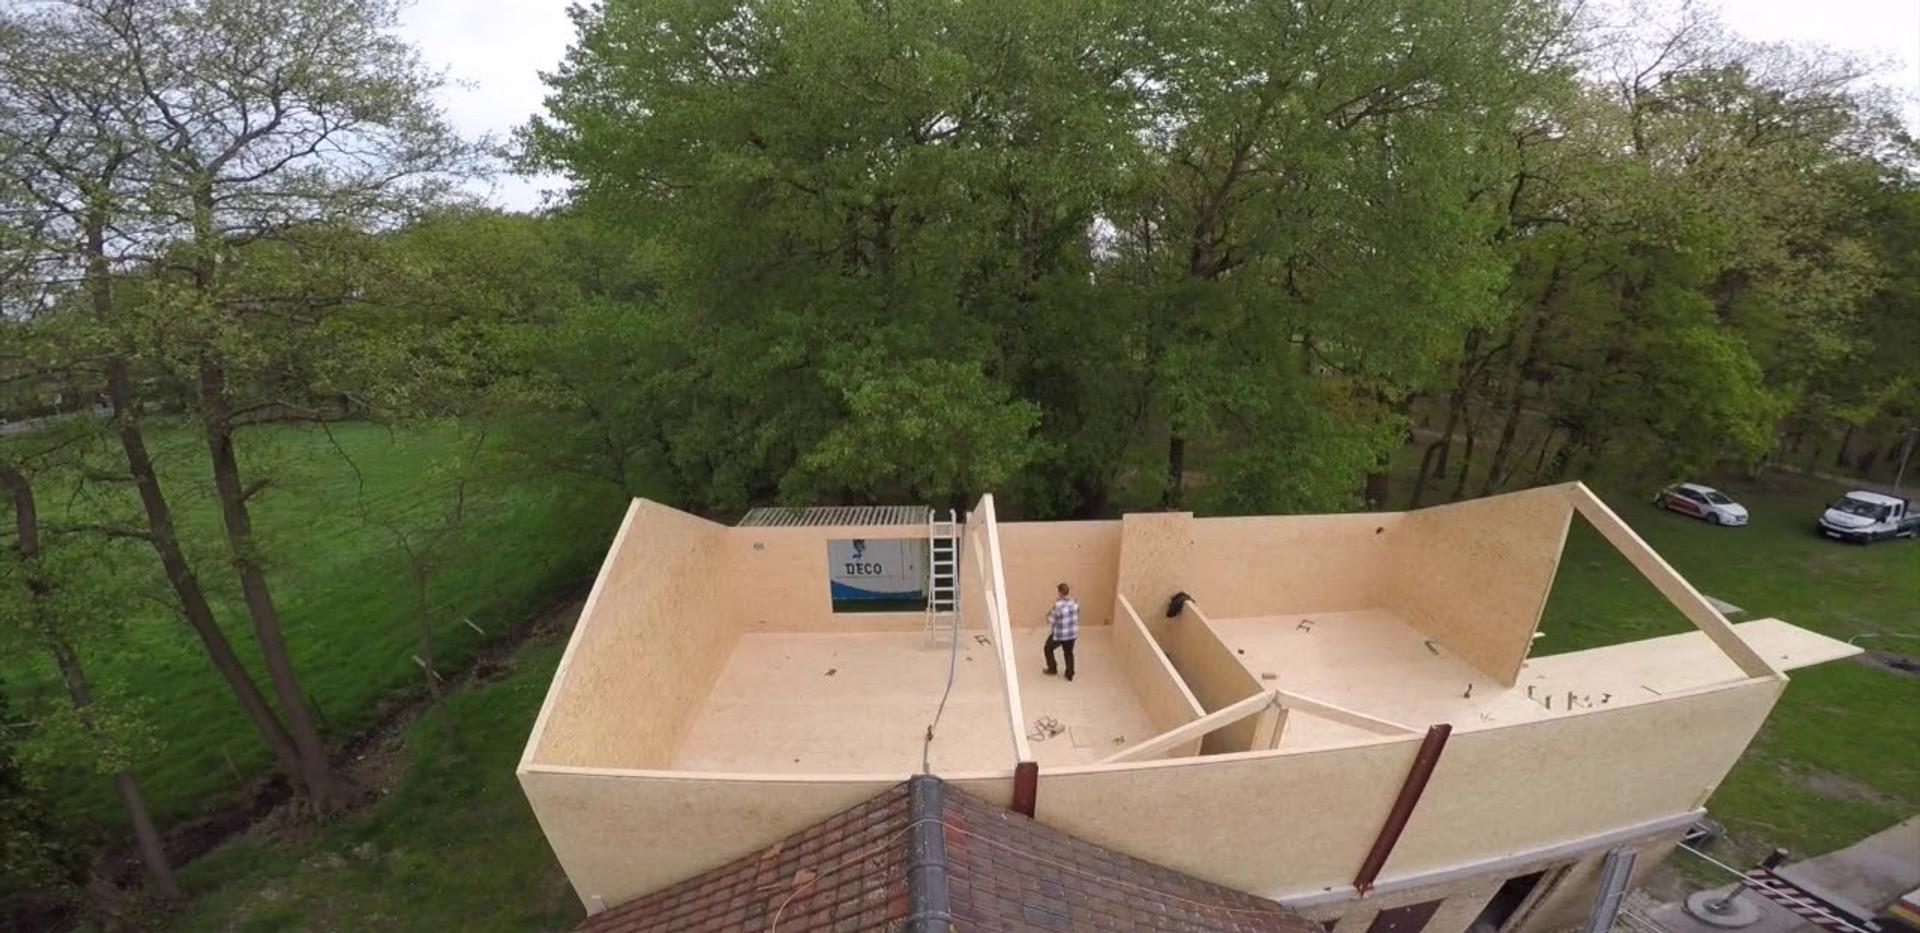 Wood & Build - Realisatie in Magnumboard - Brugge - Scouts